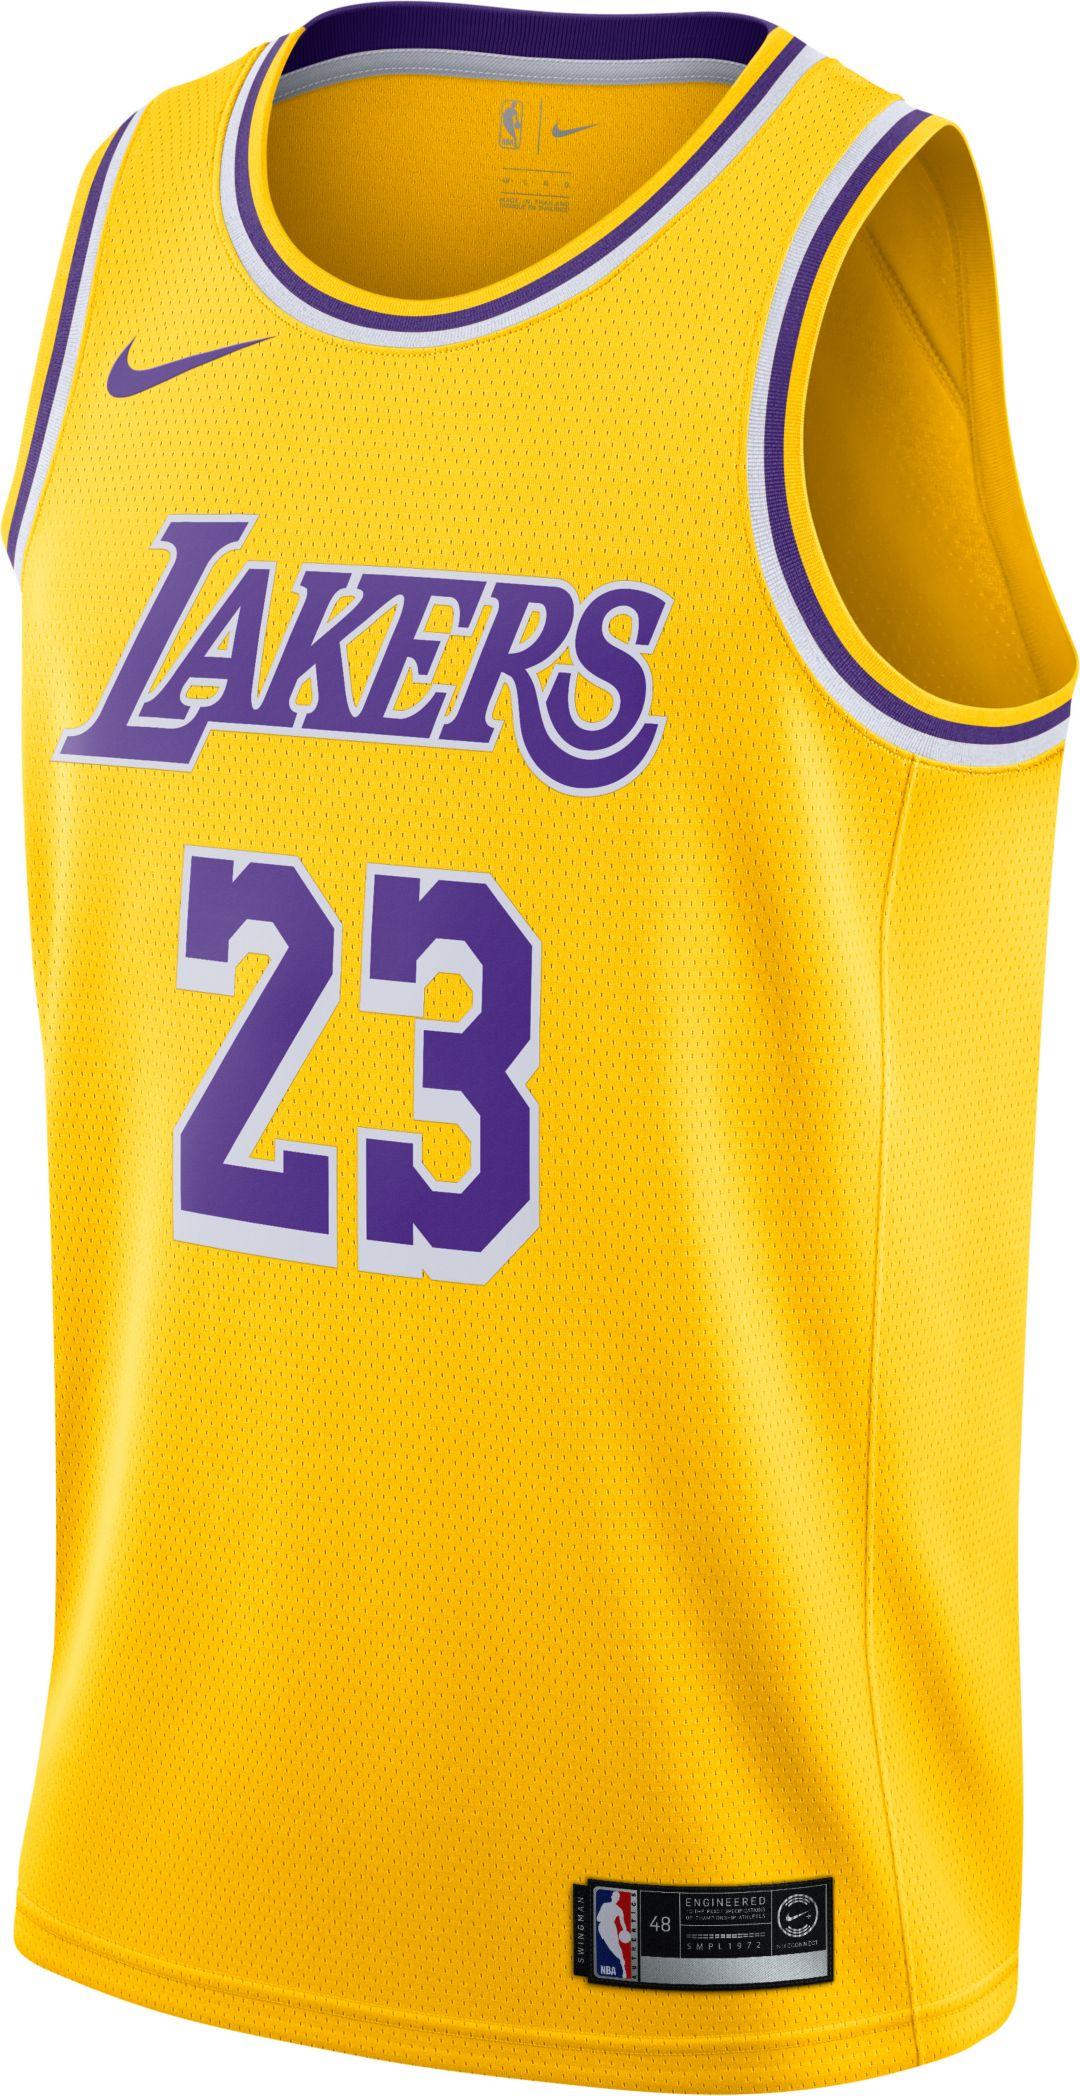 hot sale online ac3eb be705 Nike Men's Los Angeles Lakers LeBron James #23 Dri-FIT Gold Swingman Jersey